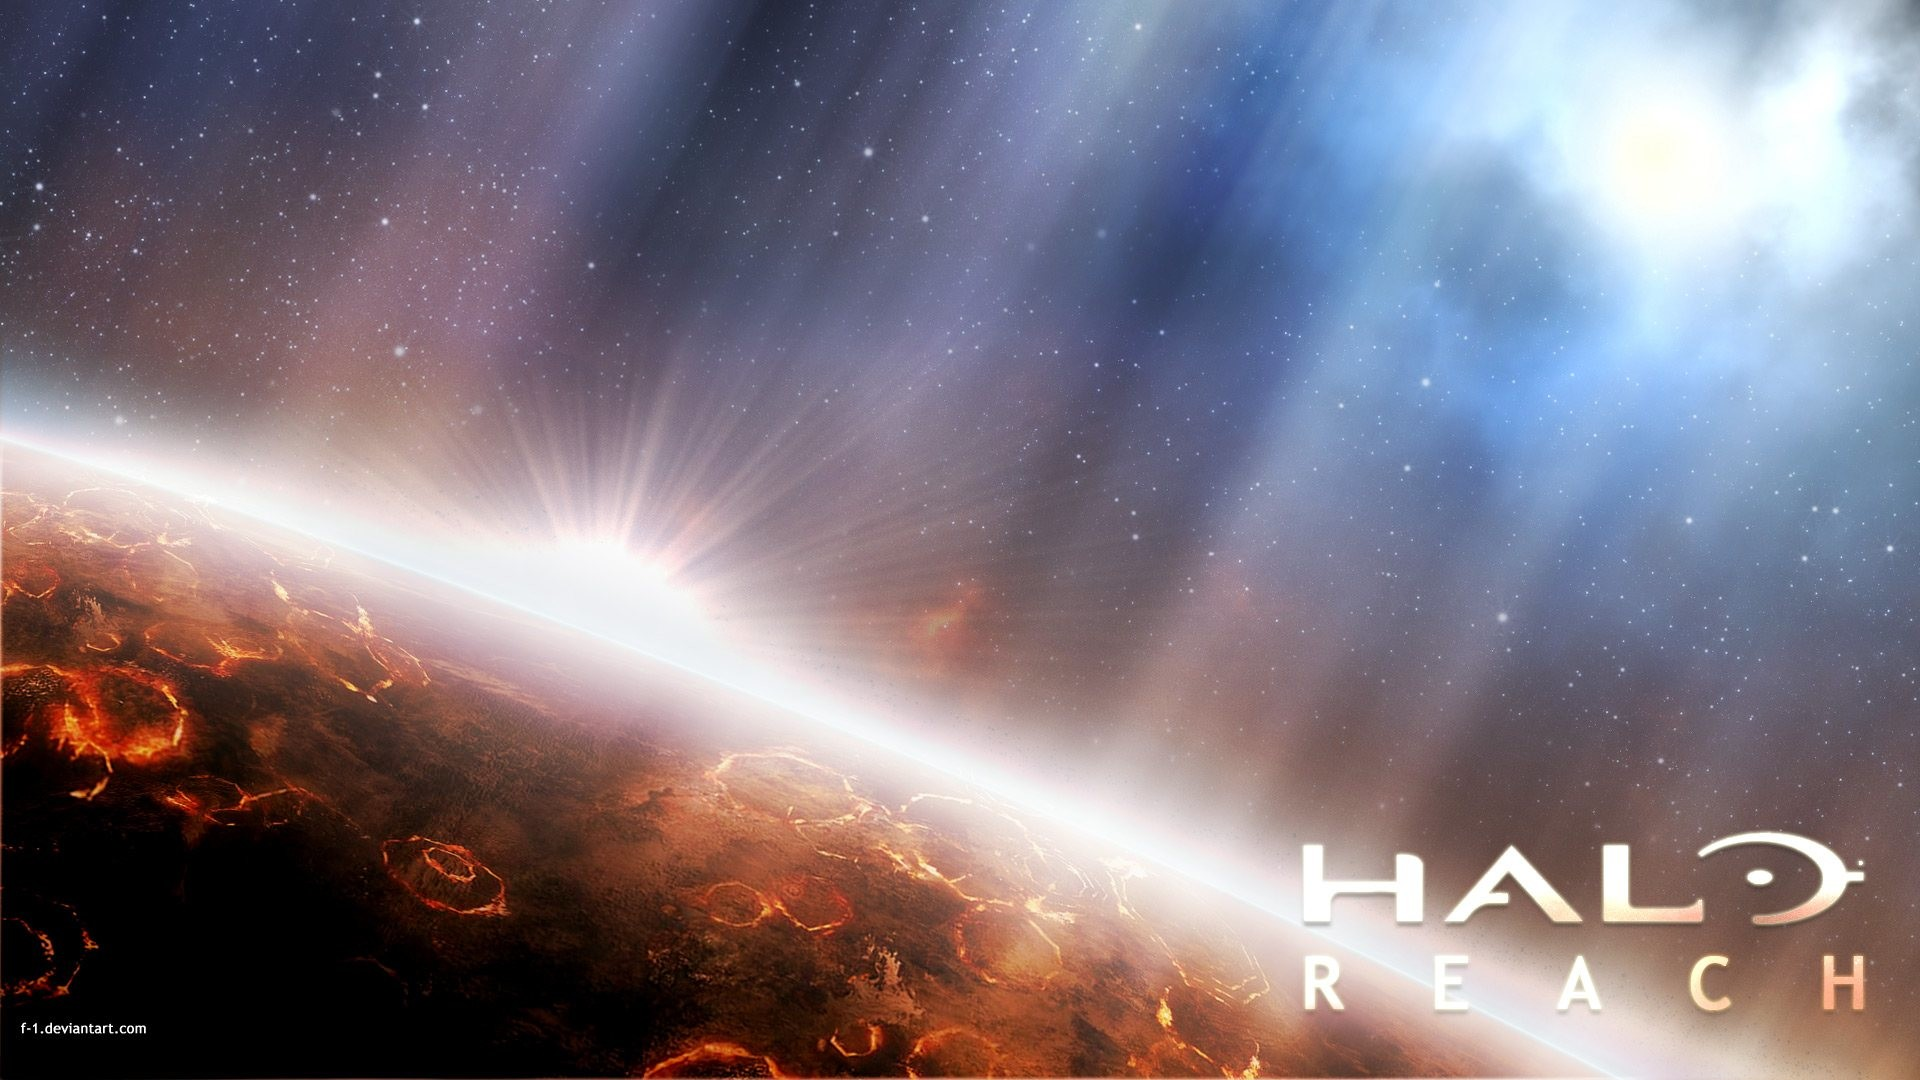 Res: 1920x1080, Halo Reach 1080p Wallpaper Halo Reach 720p Wallpaper